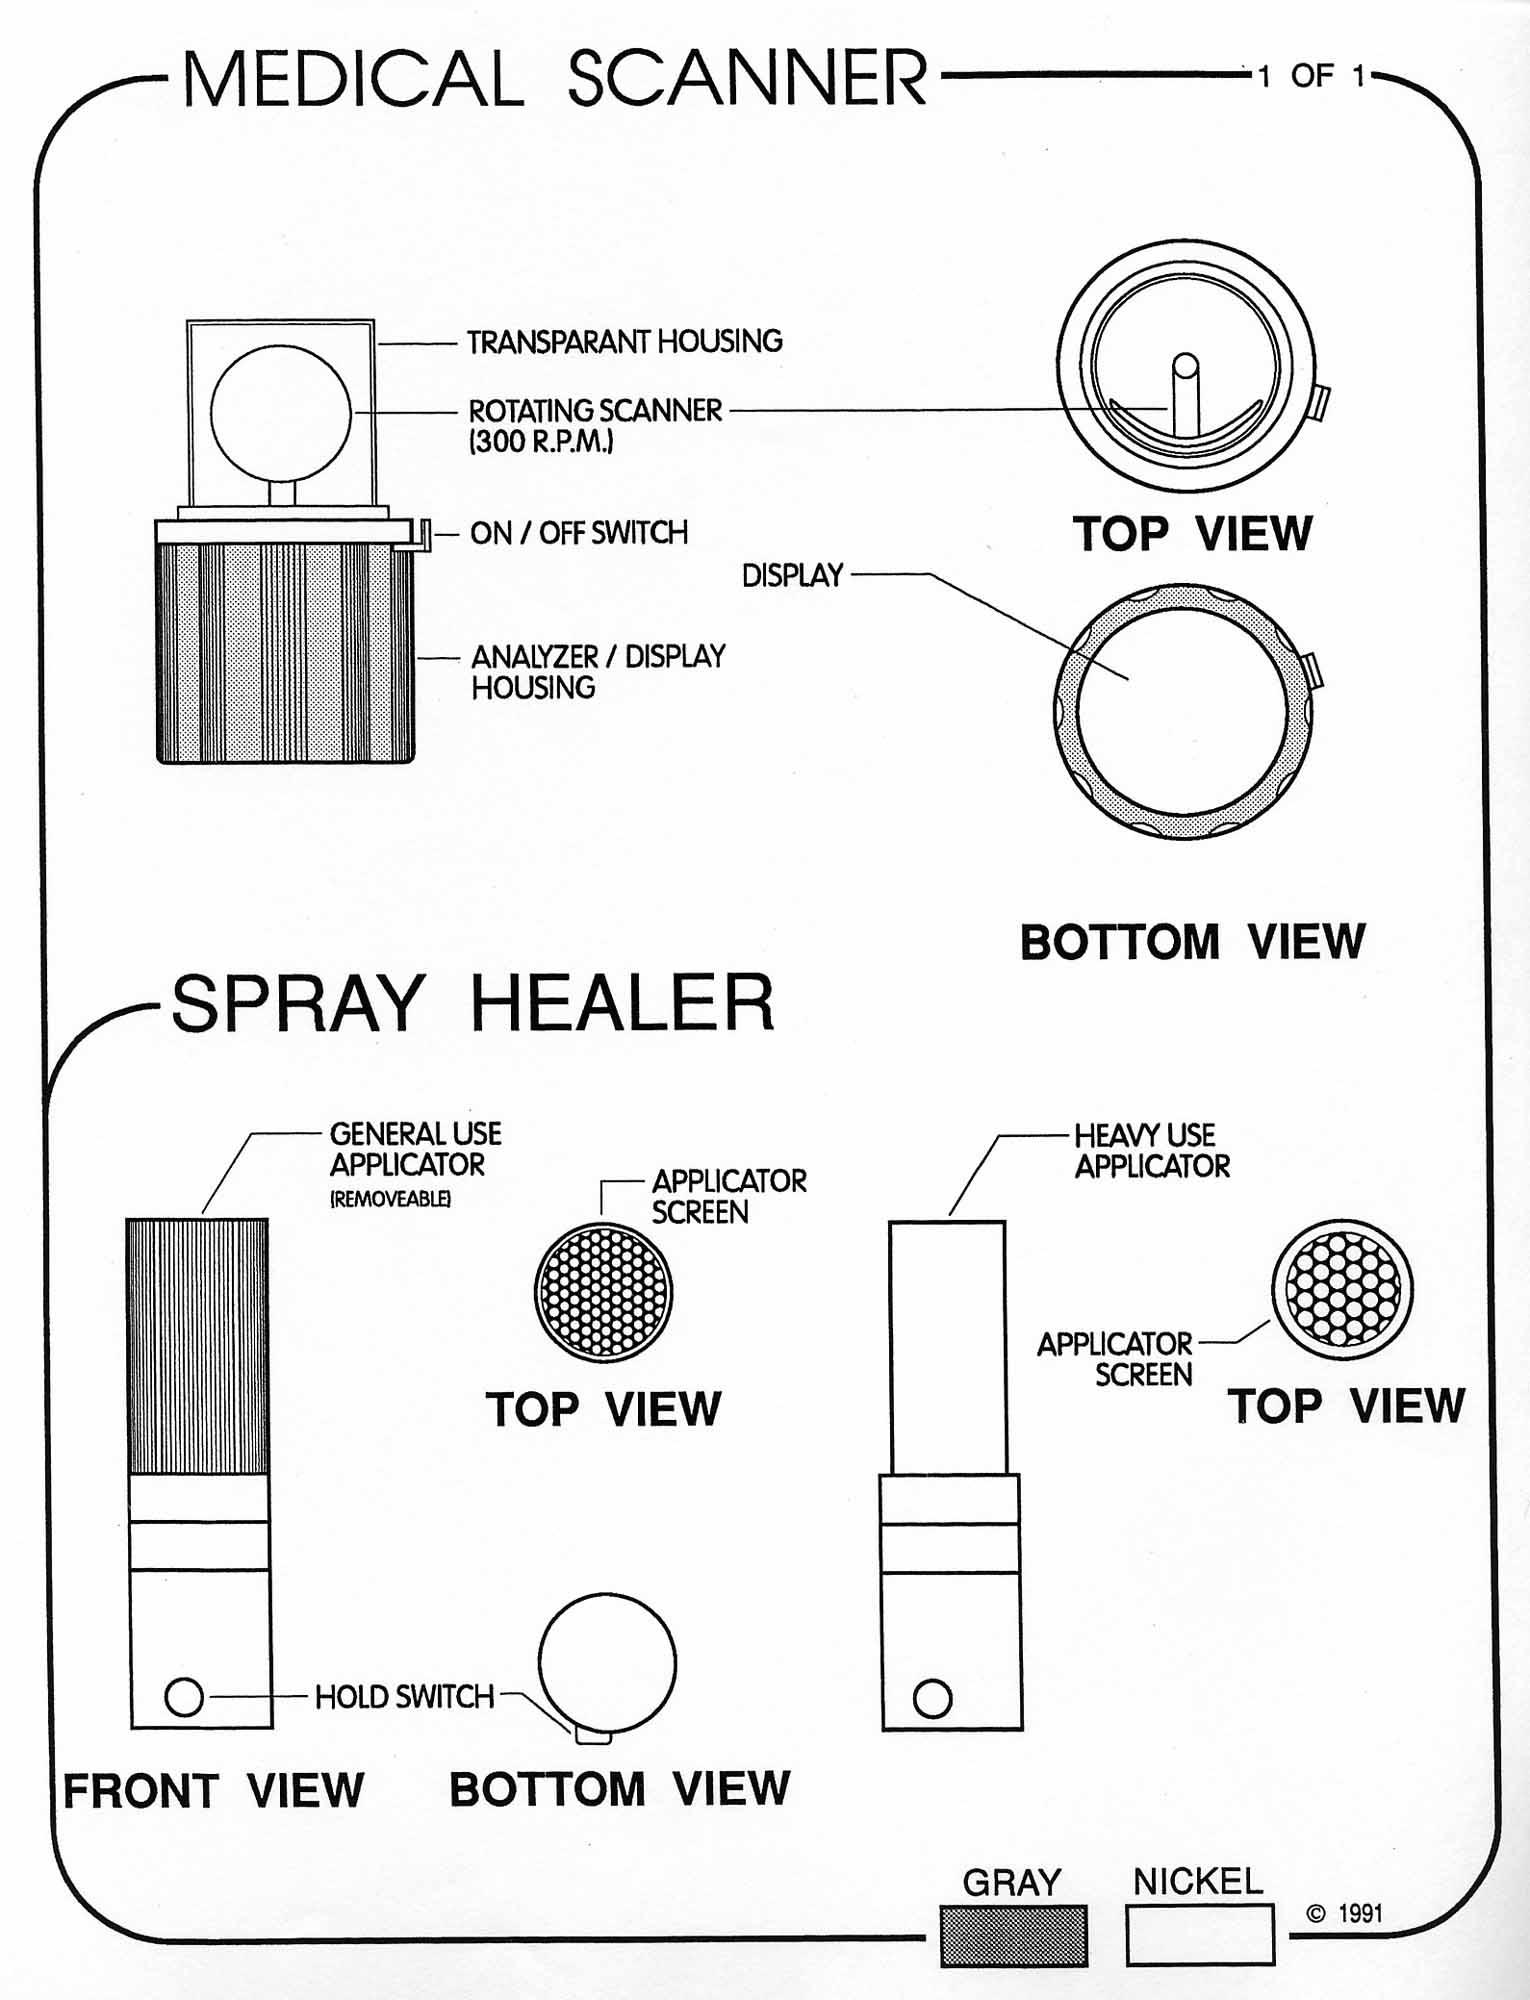 Star trek blueprints uss enterprise equipment packet sheet 5 medical scanner spray healer multiple views malvernweather Choice Image